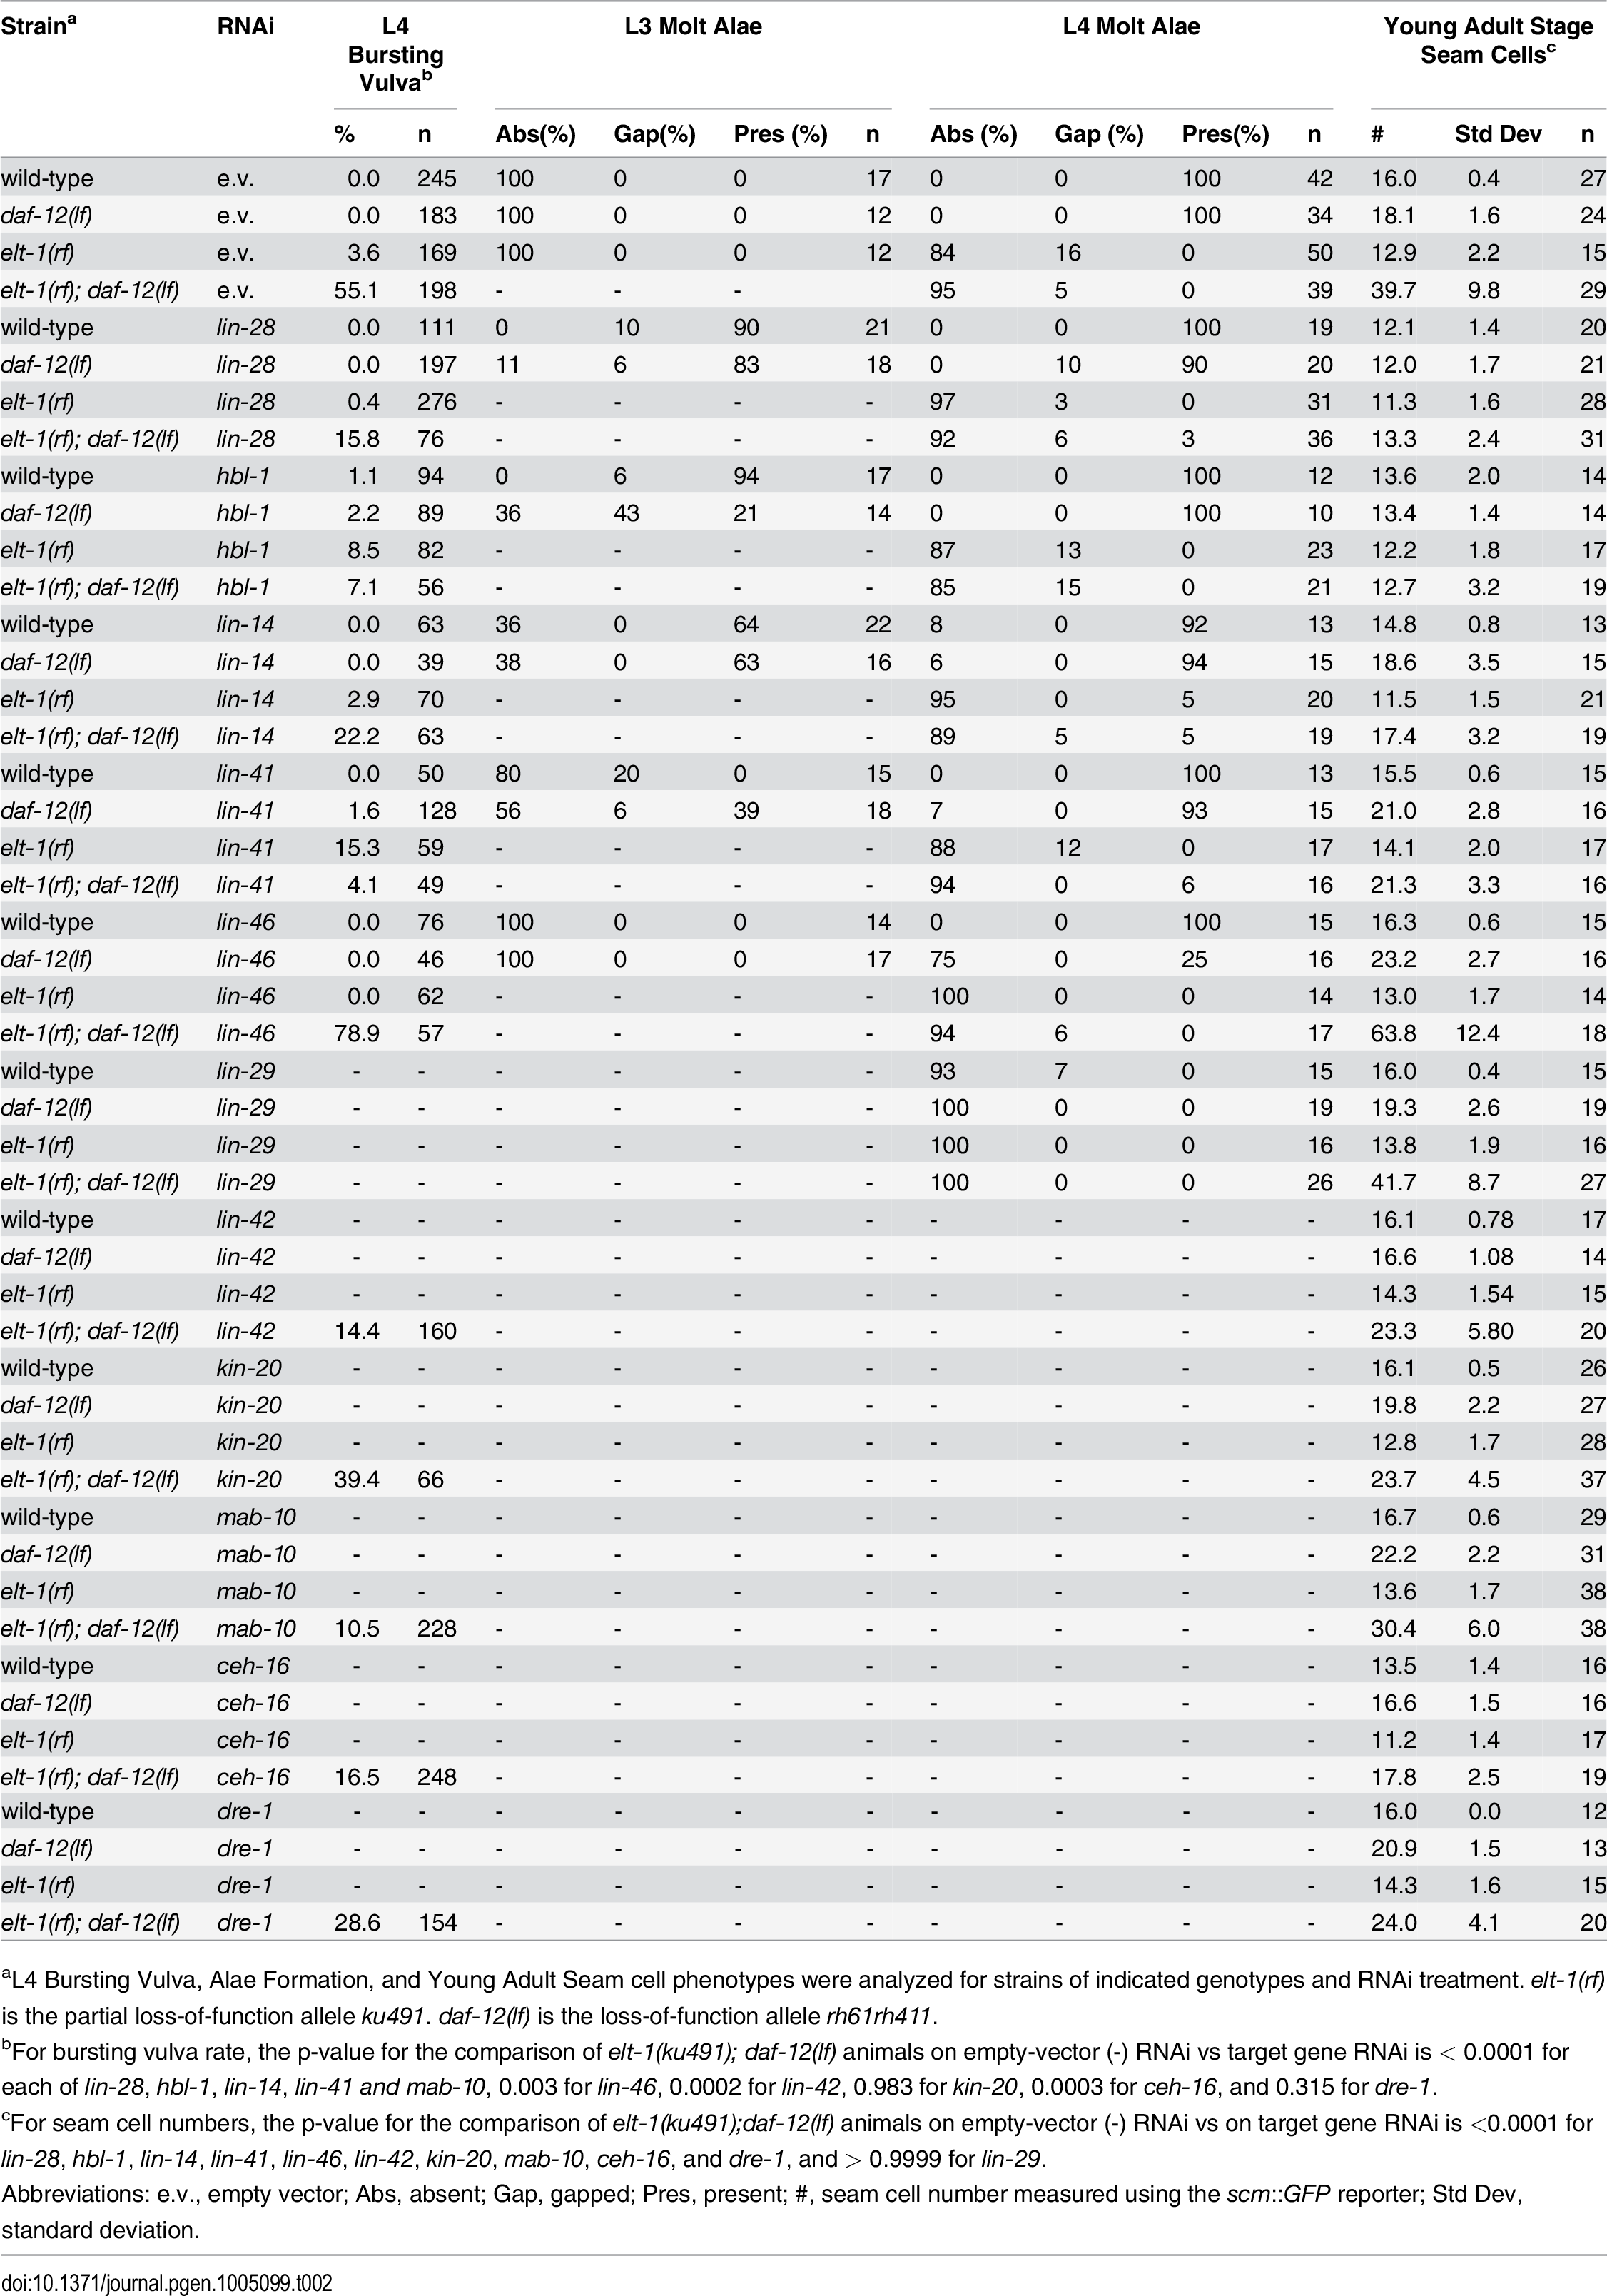 Epistasis analysis of <i>elt-1(ku491); daf-12(rh61rh411)</i> mutant phenotypes with RNAi of other heterochronic genes.